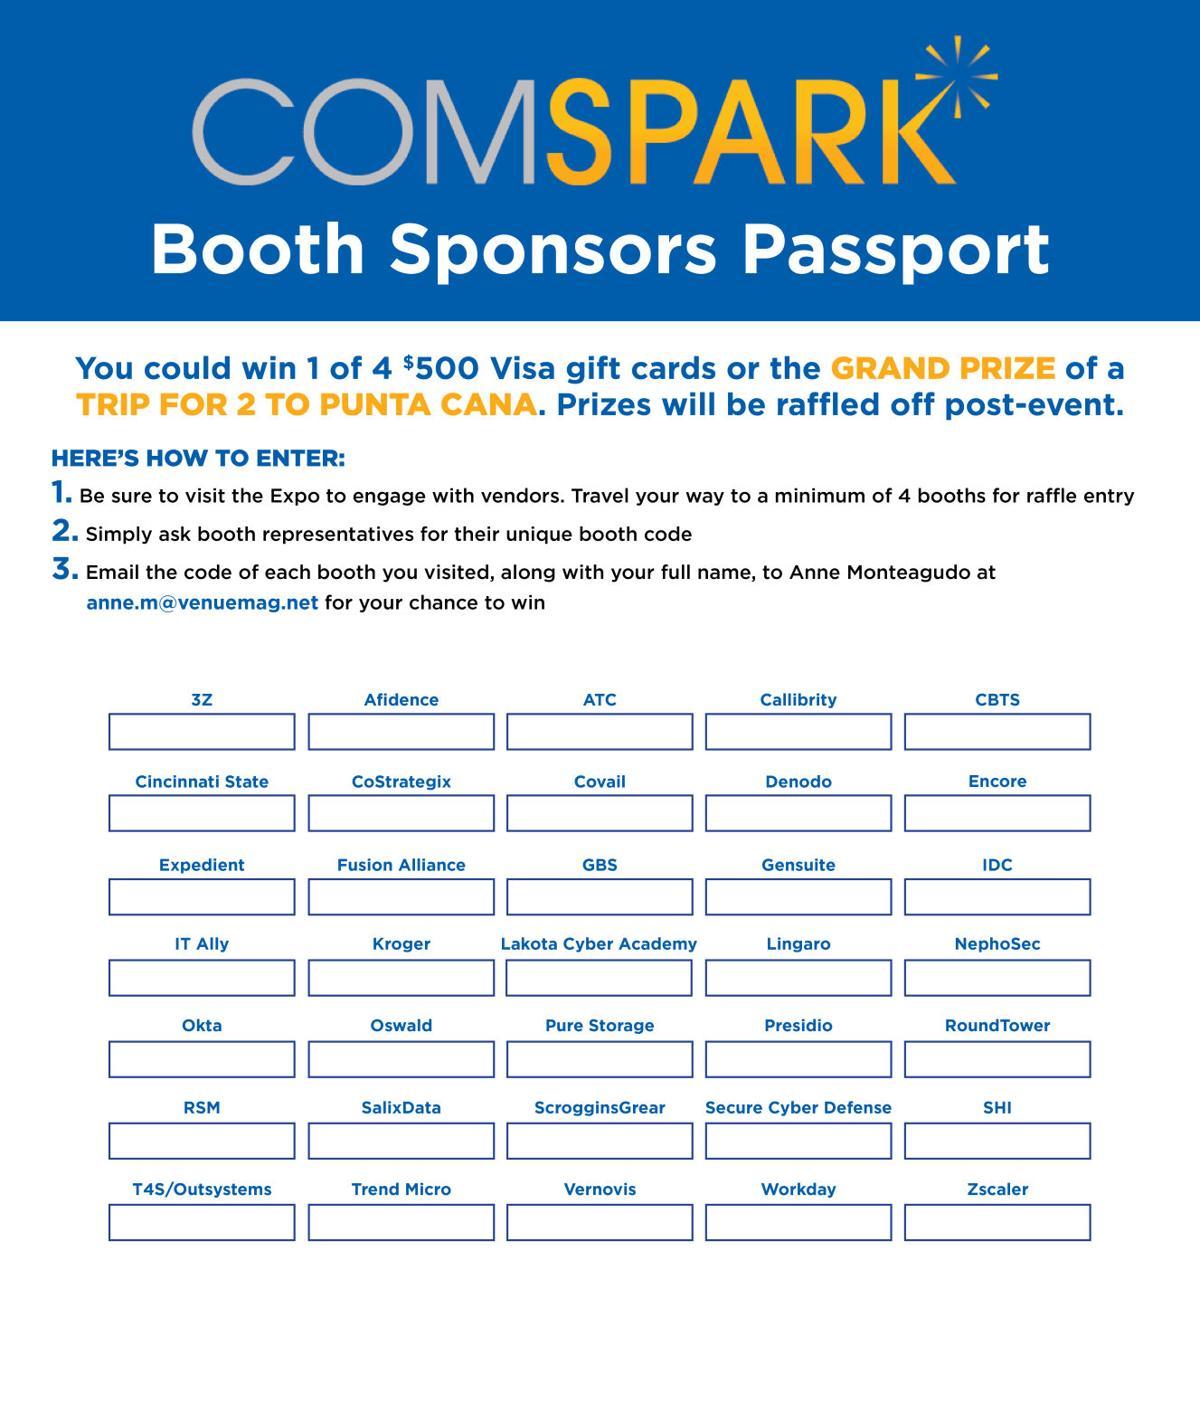 Comspark Booth Sponsors Passport